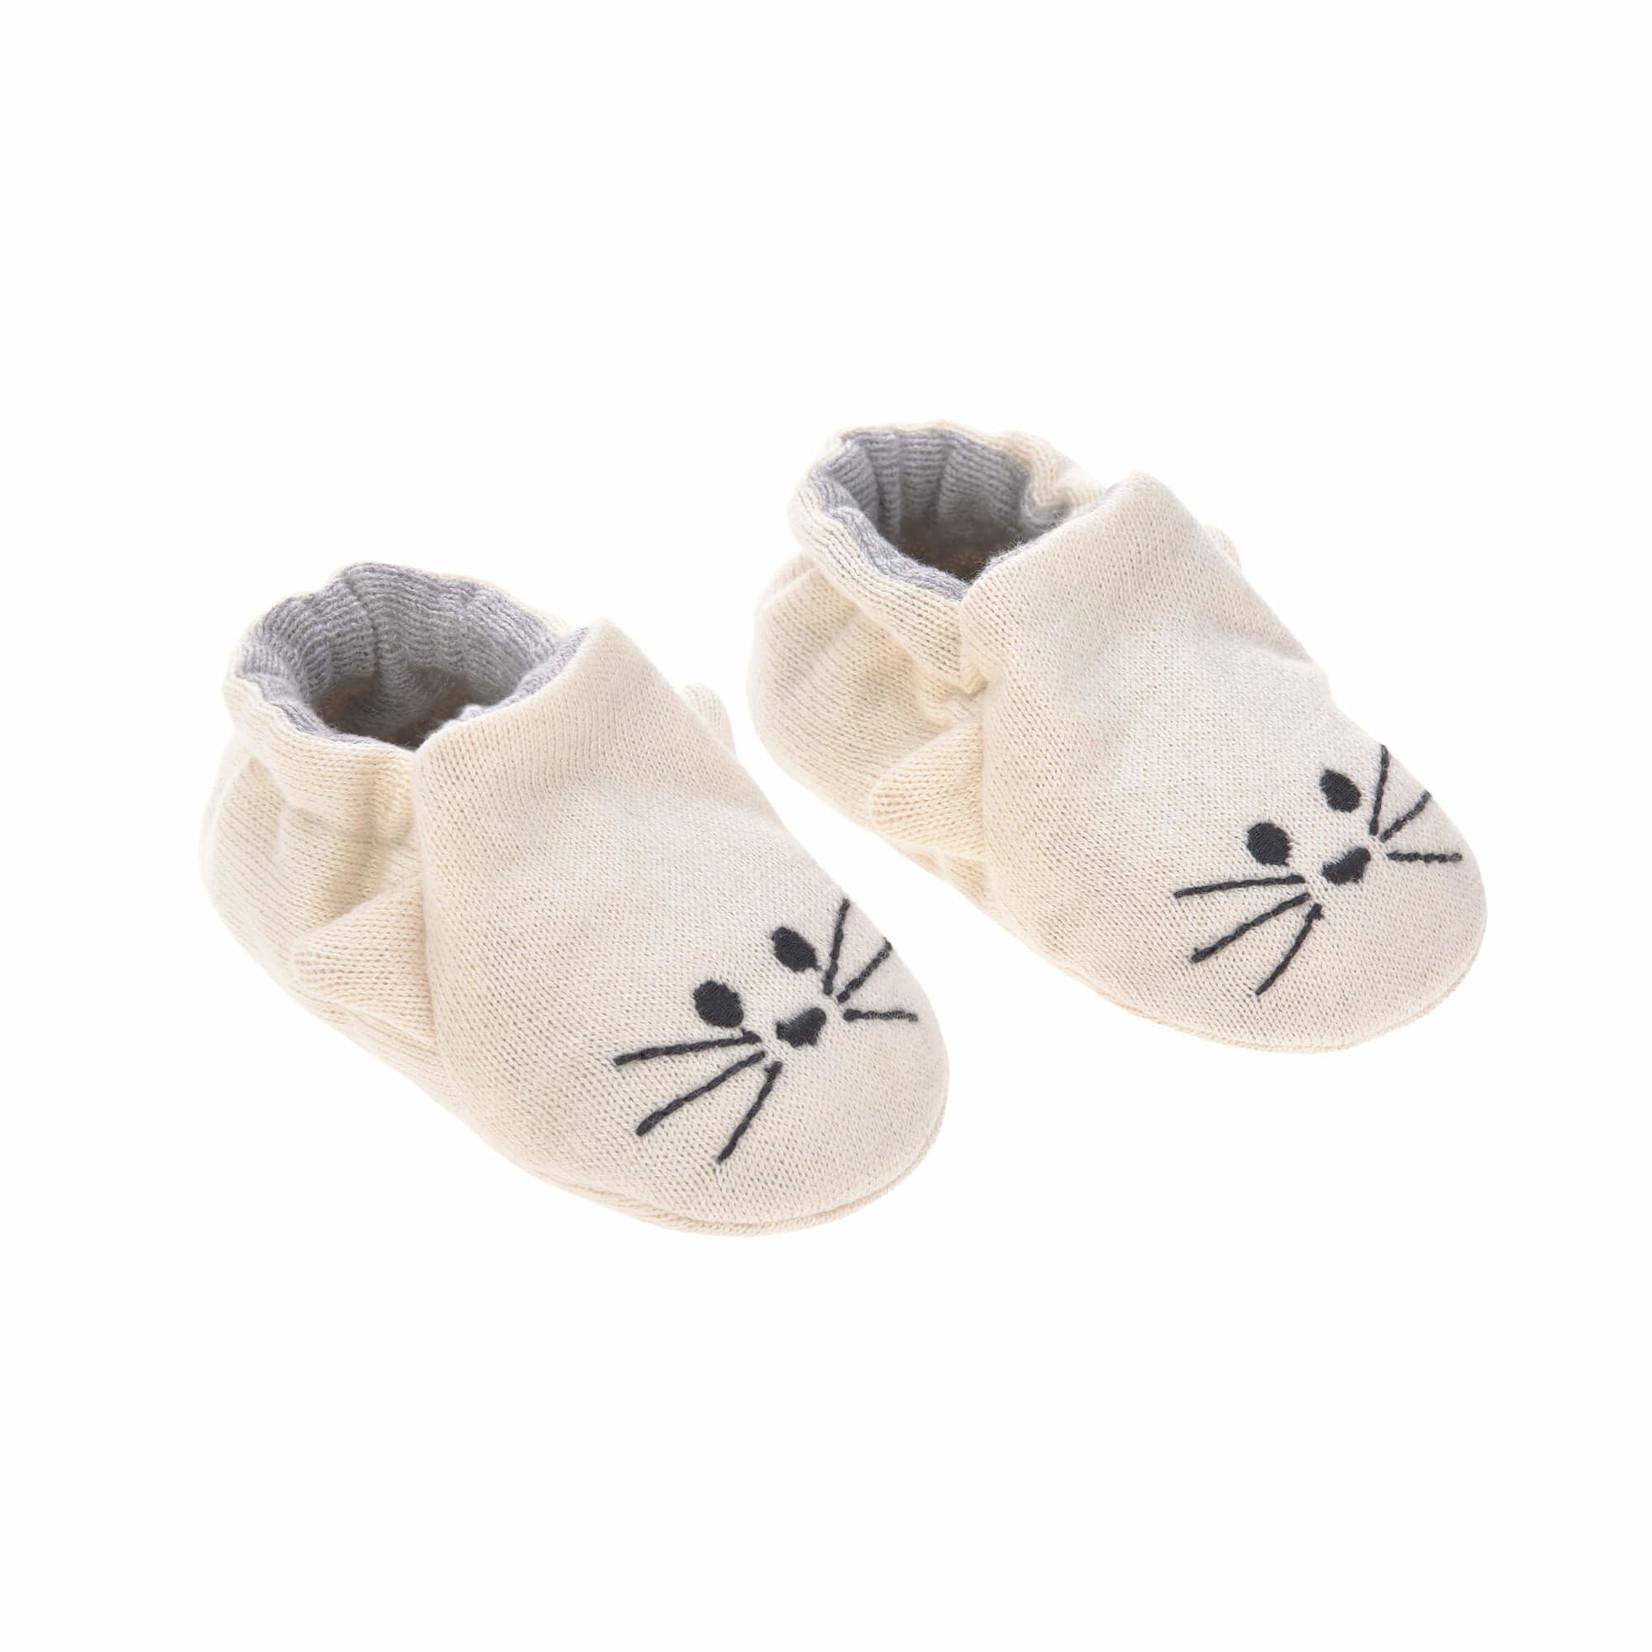 Lässig Baby Shoes GOTS Little Chums Cat, One Size